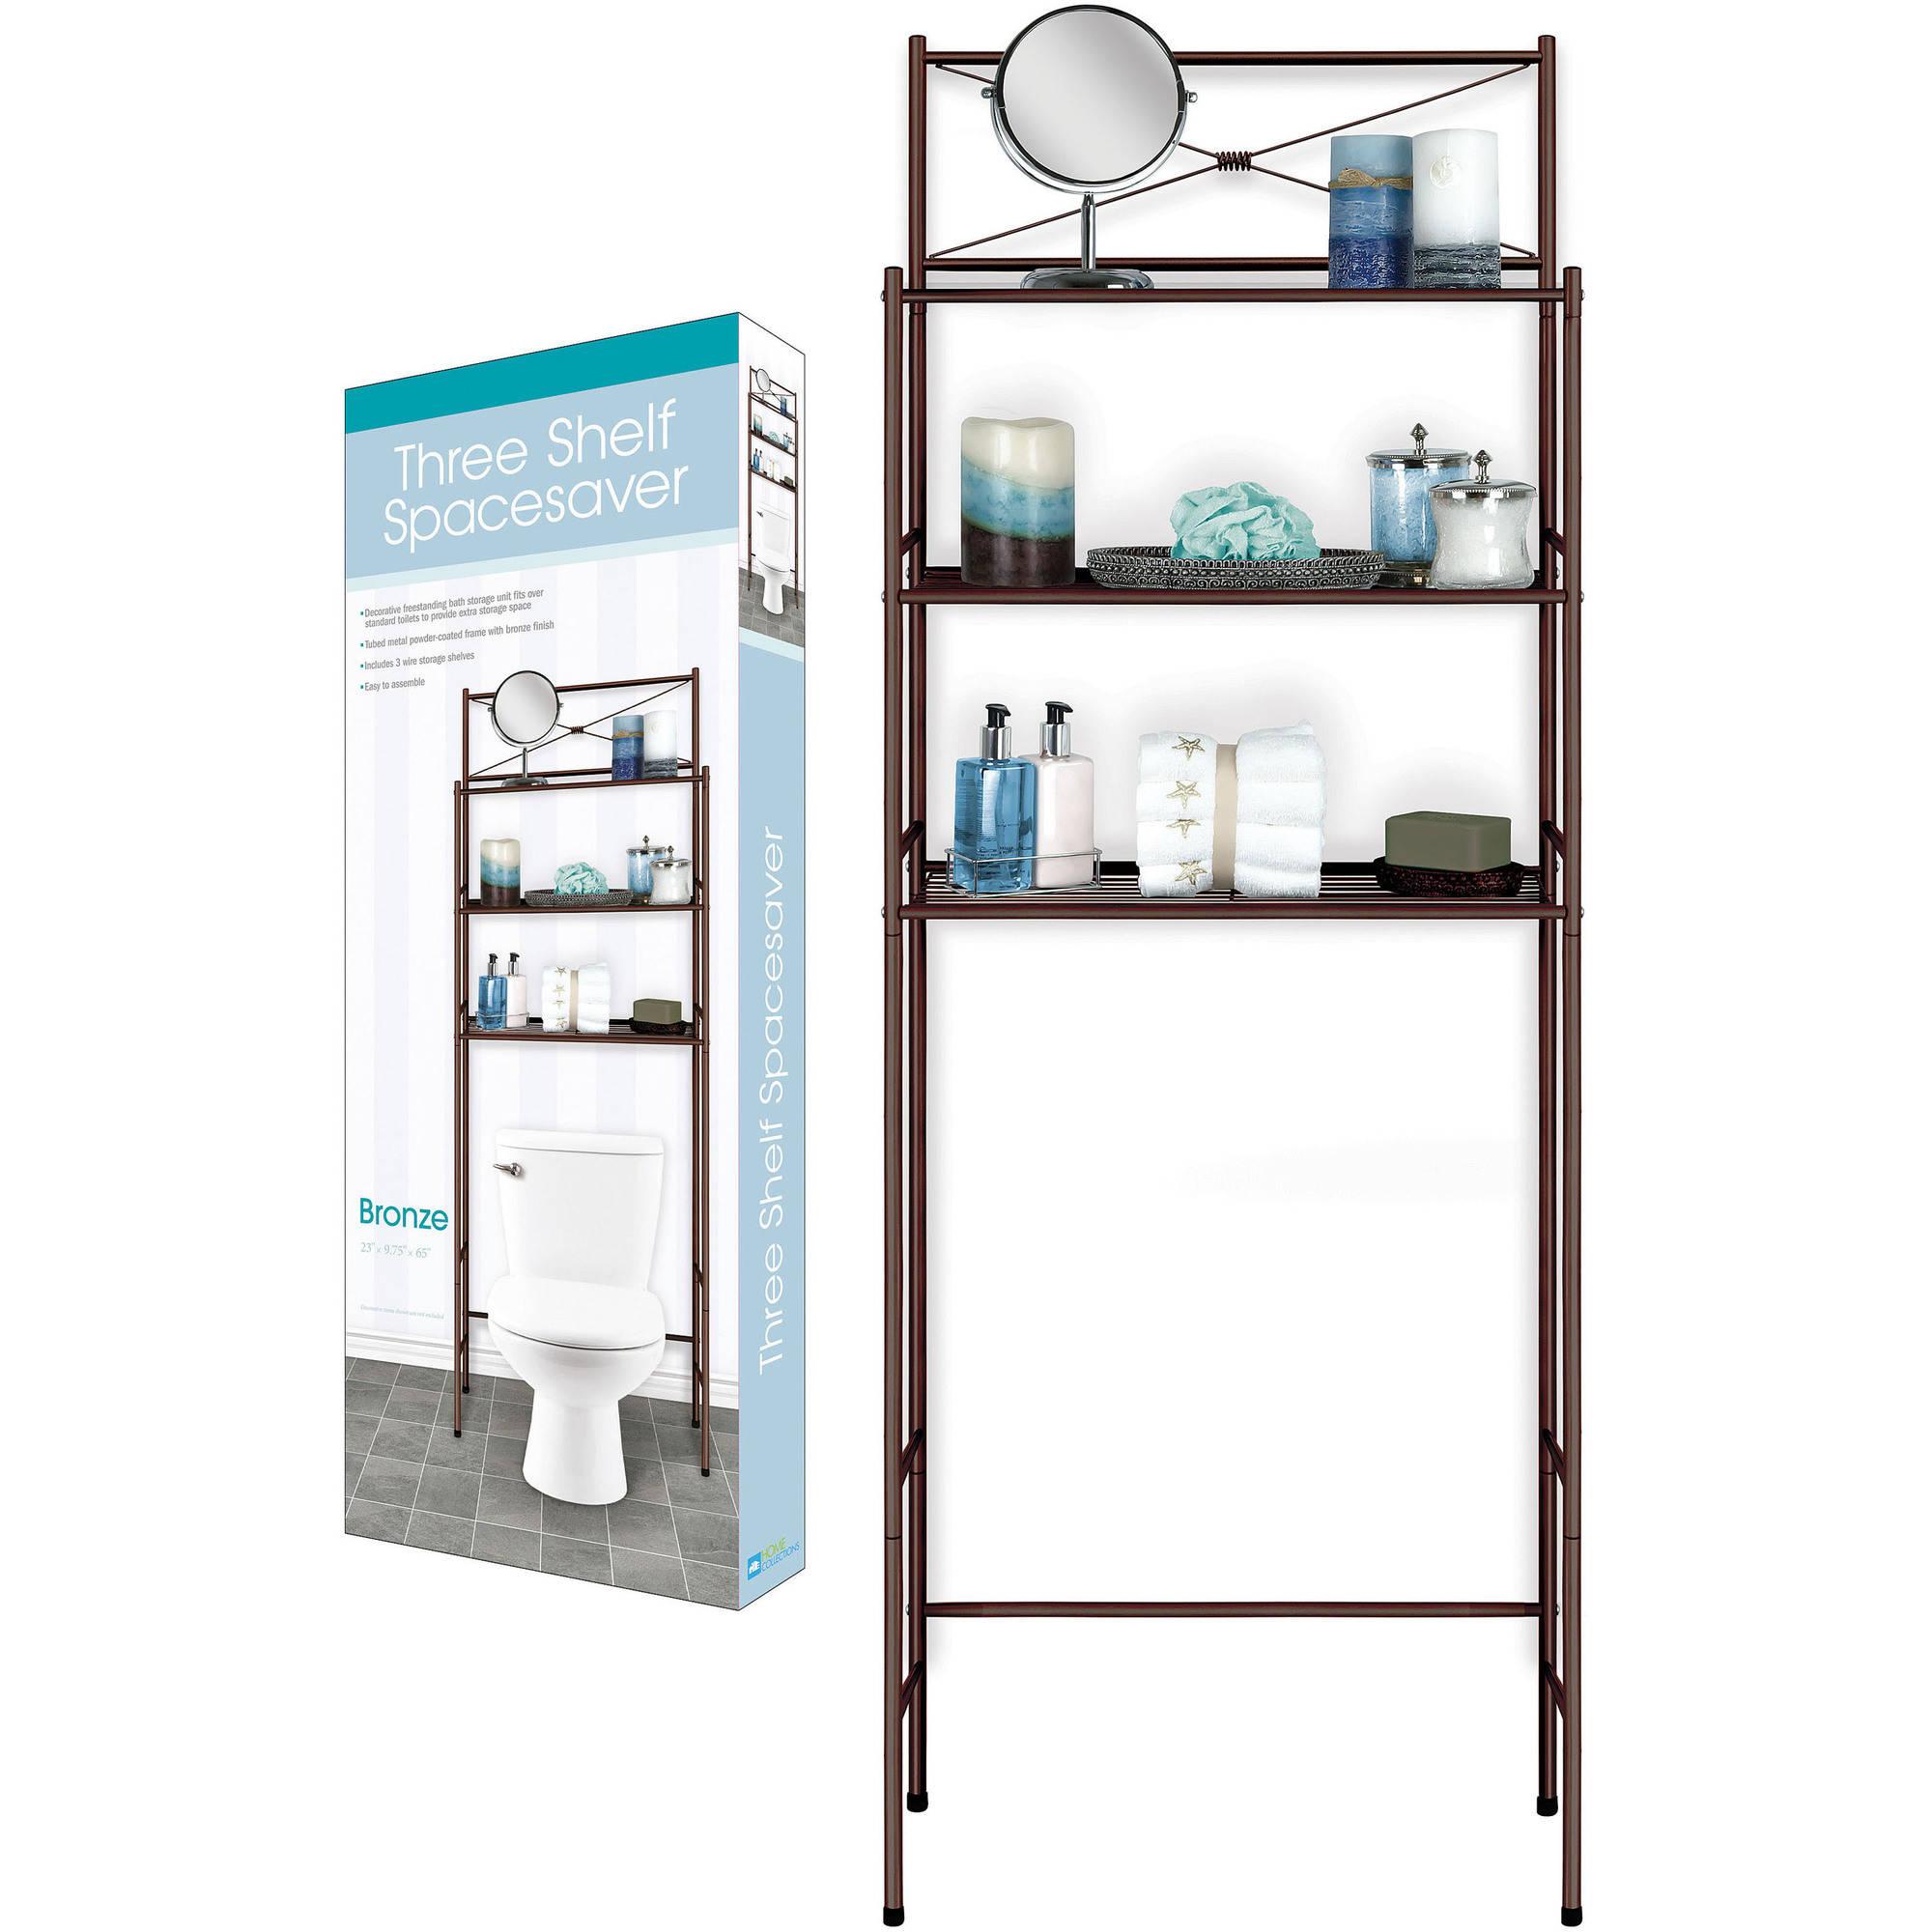 Three-Shelf Space Saver, Bronze